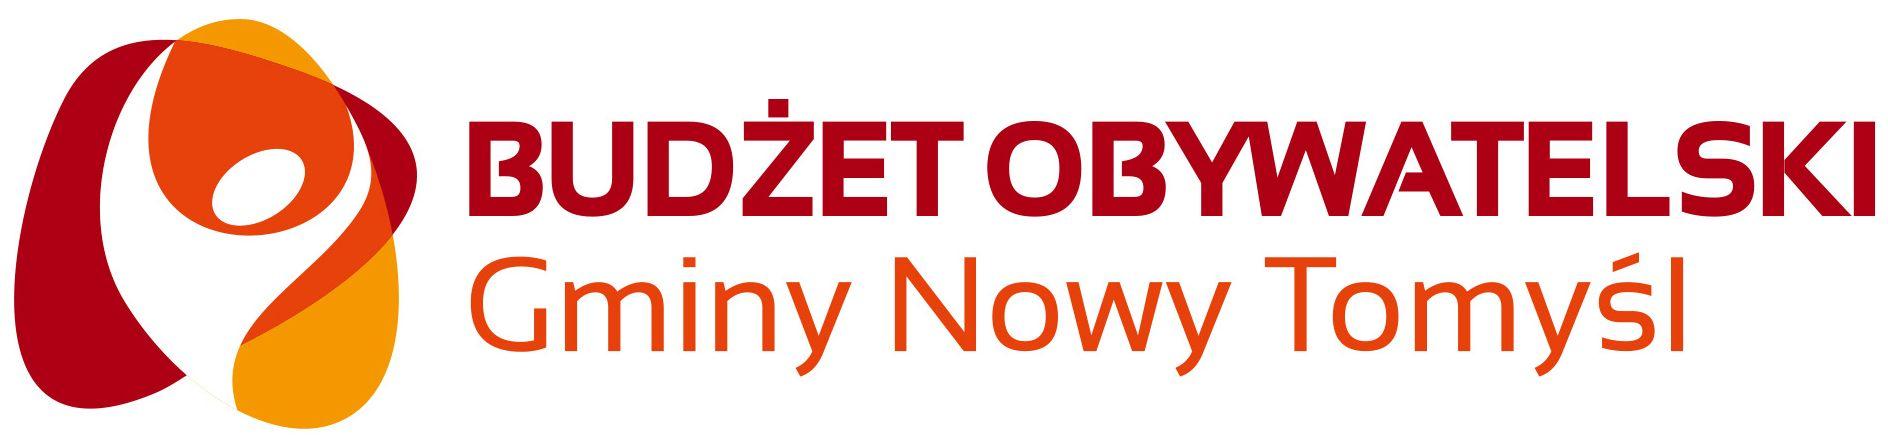 Nowotomyski budżet obywatelski